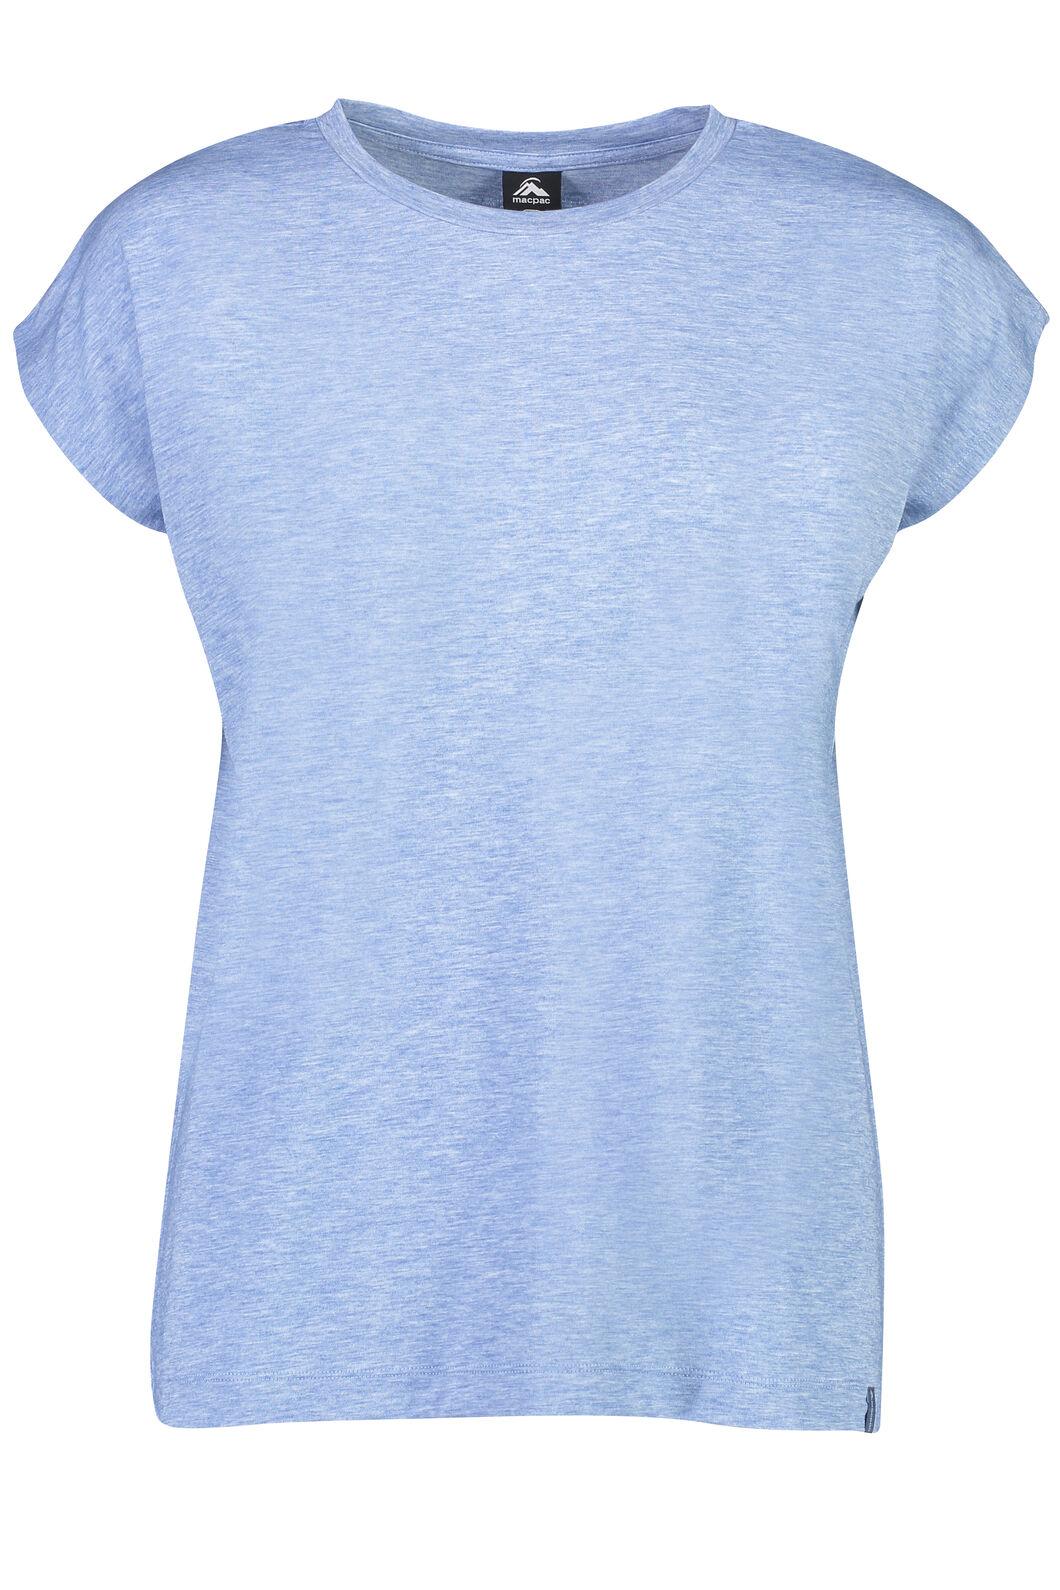 Horizon Tee - Women's, Bright Cobalt, hi-res